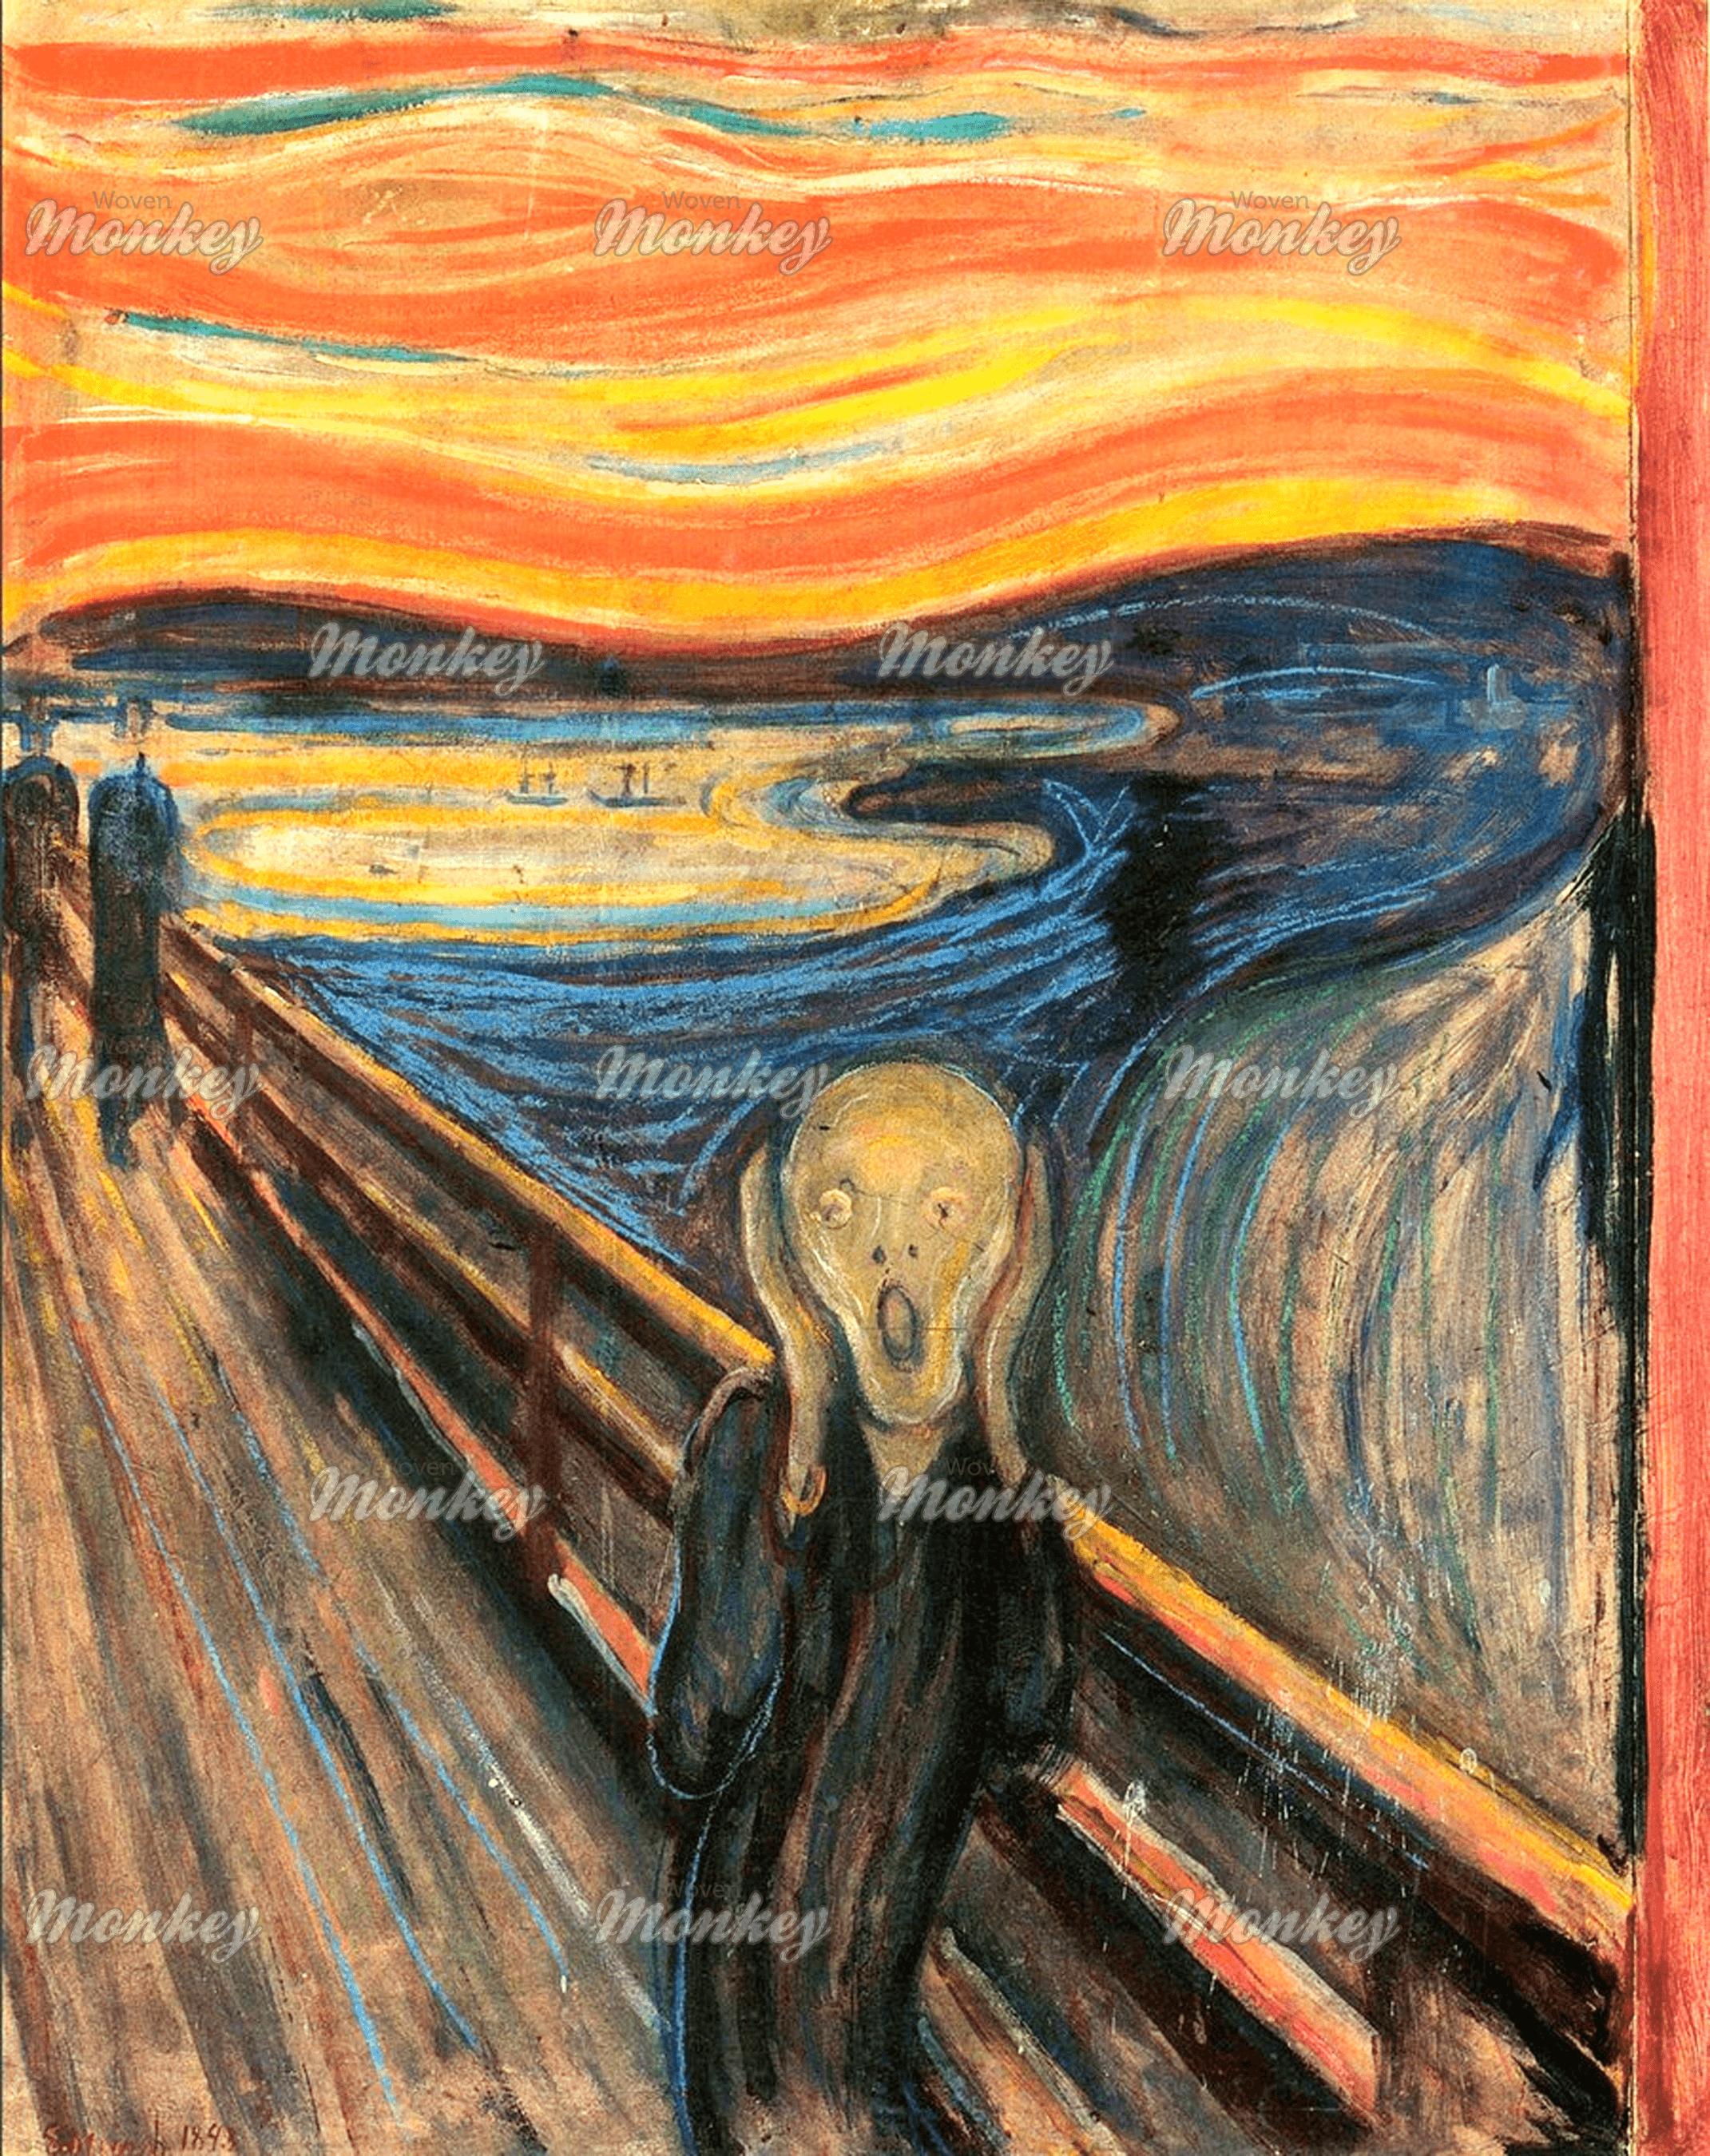 Edvard Munch - The Scream, 1893 | Fabric | Woven Monkey